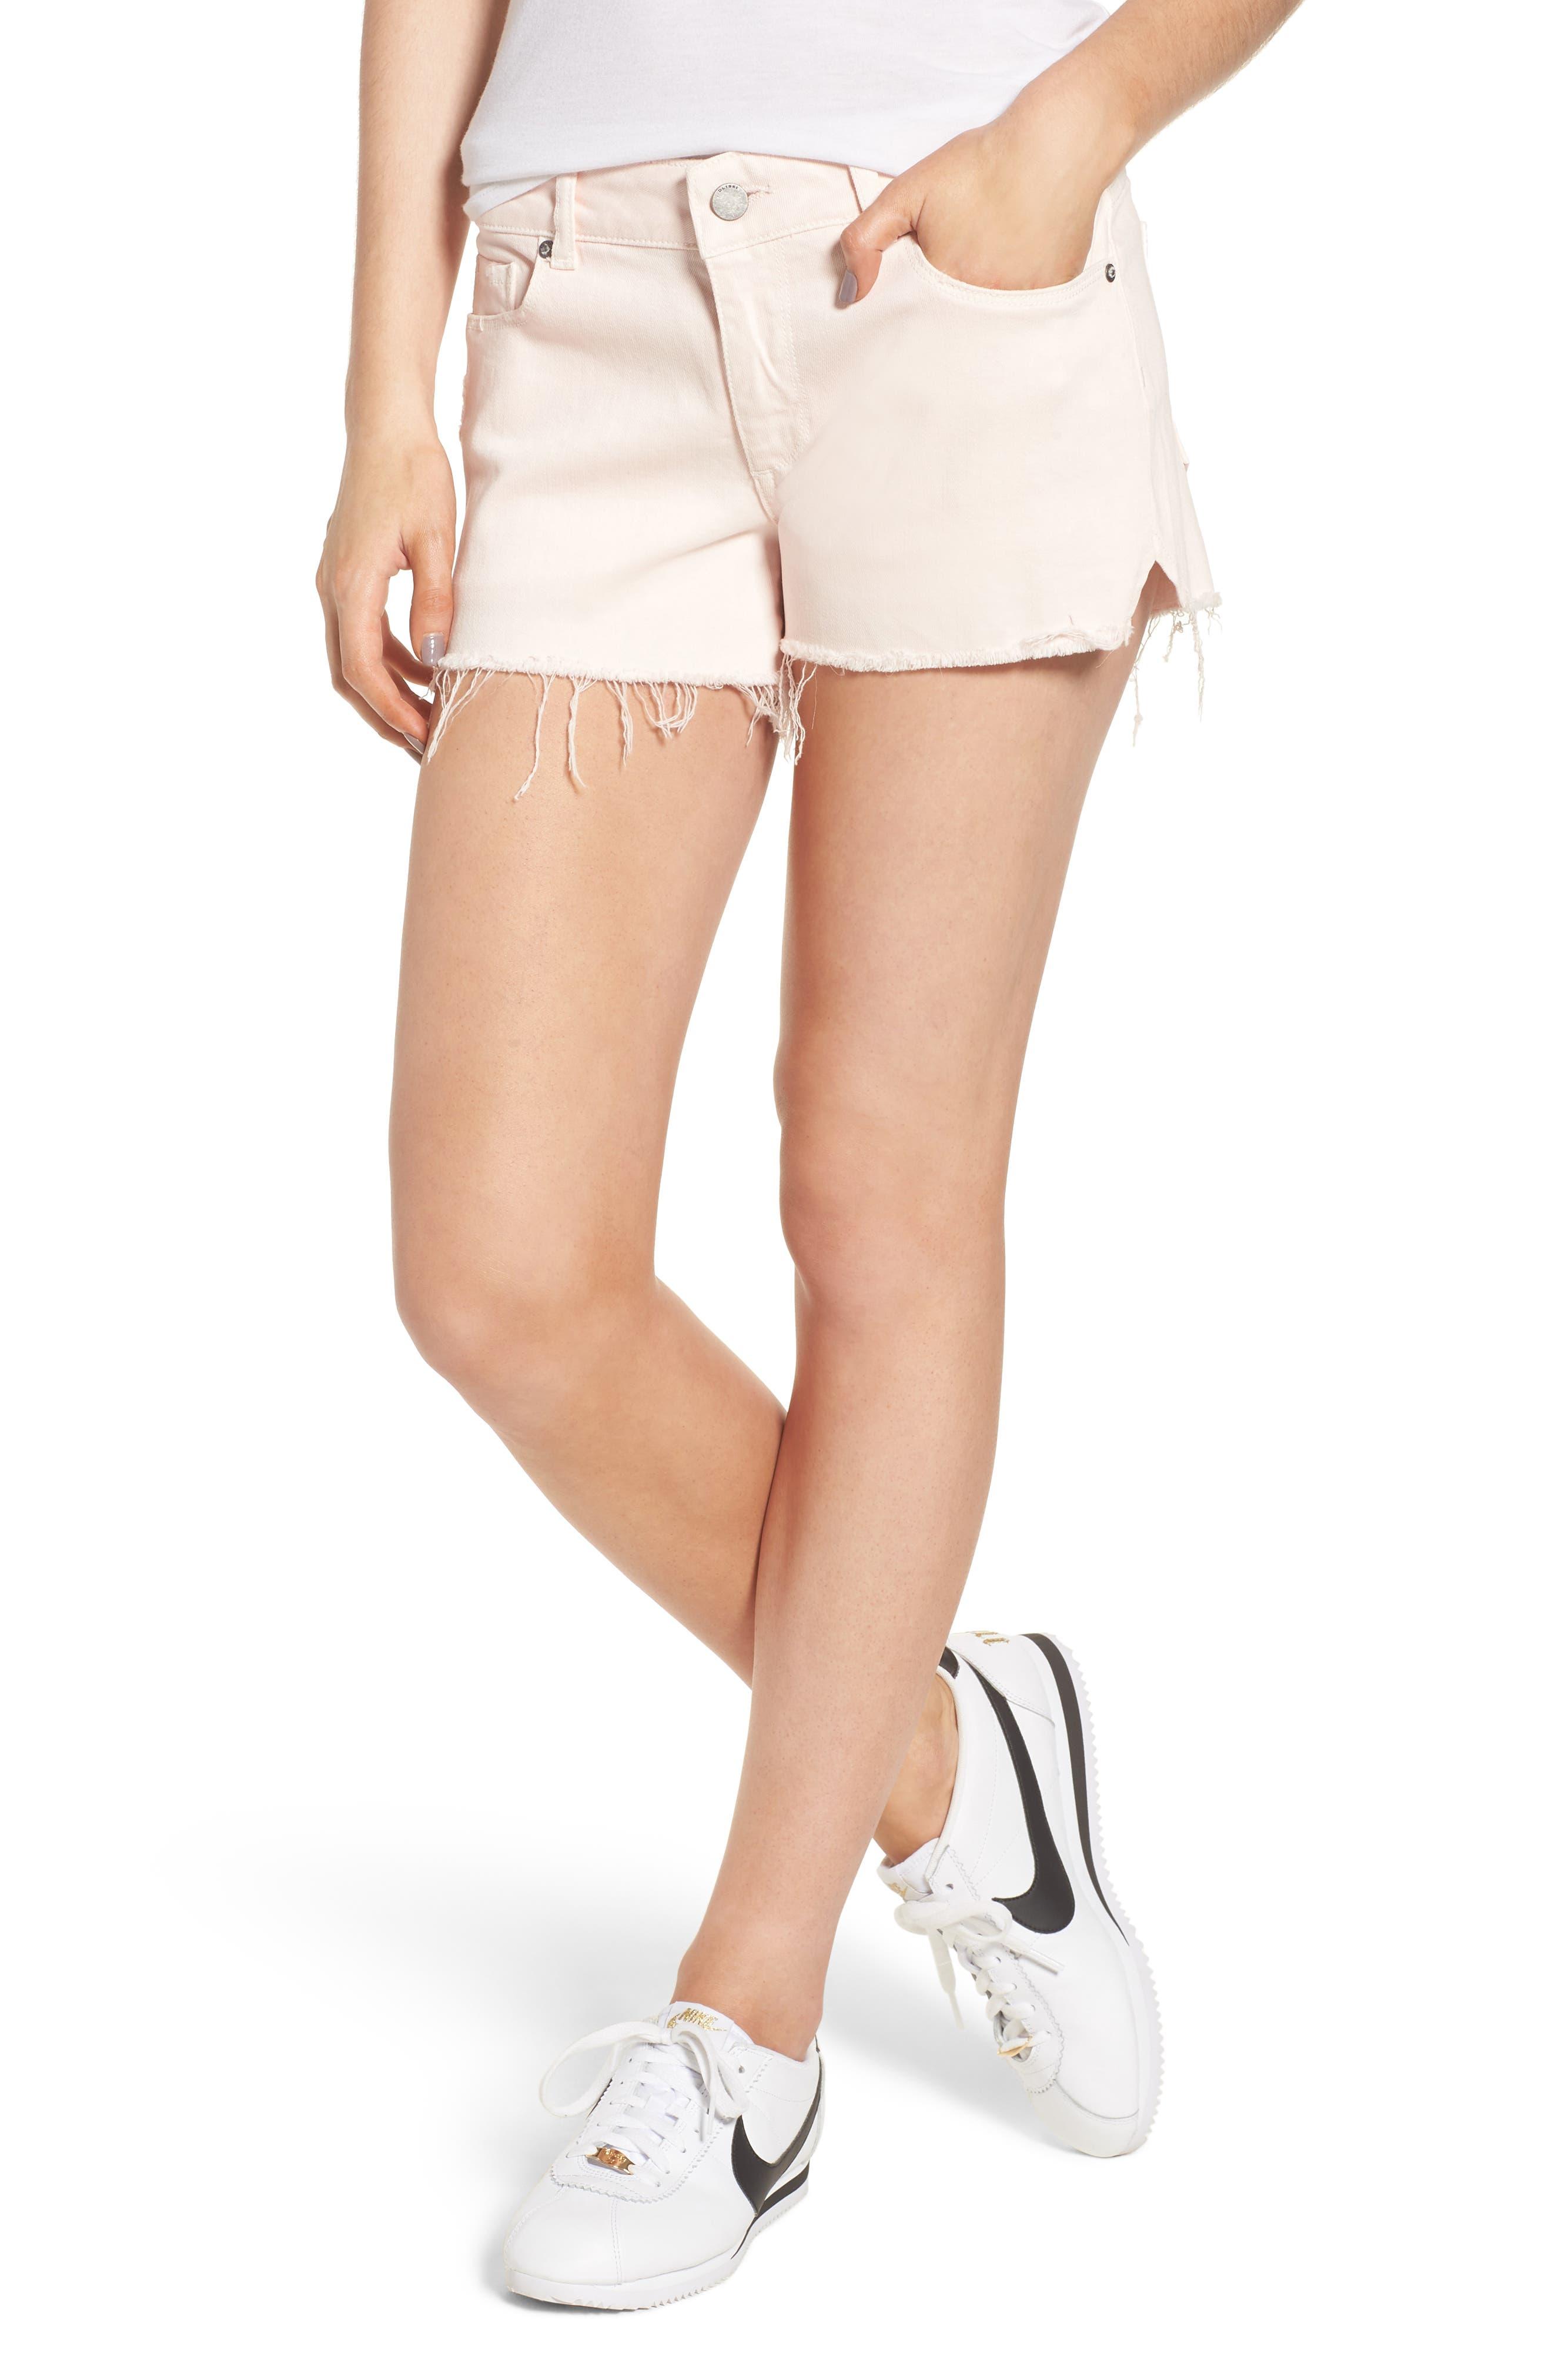 Renee Notch Raw Hem Denim Shorts,                             Main thumbnail 1, color,                             Blush Pink